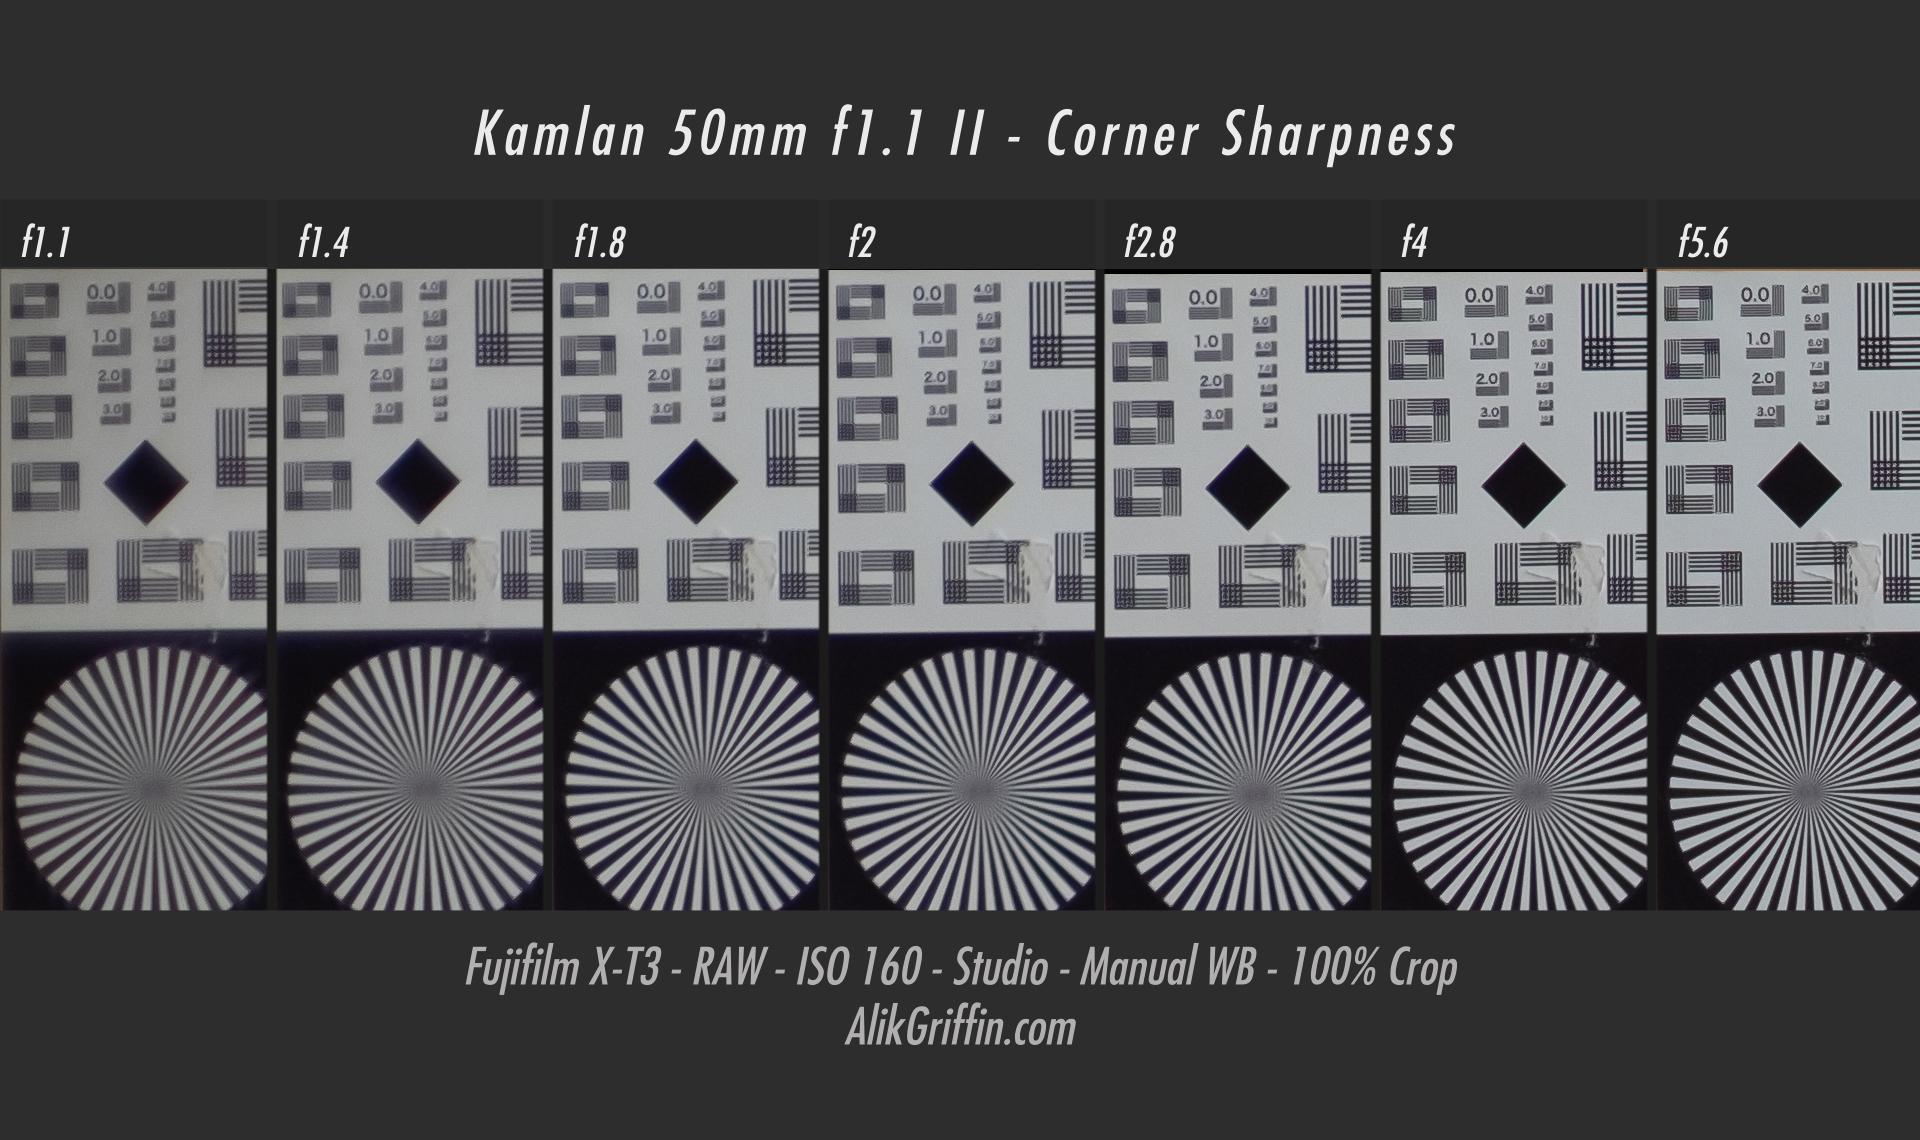 Kamlan 50mm f1.1 mkII Corner Sharpness